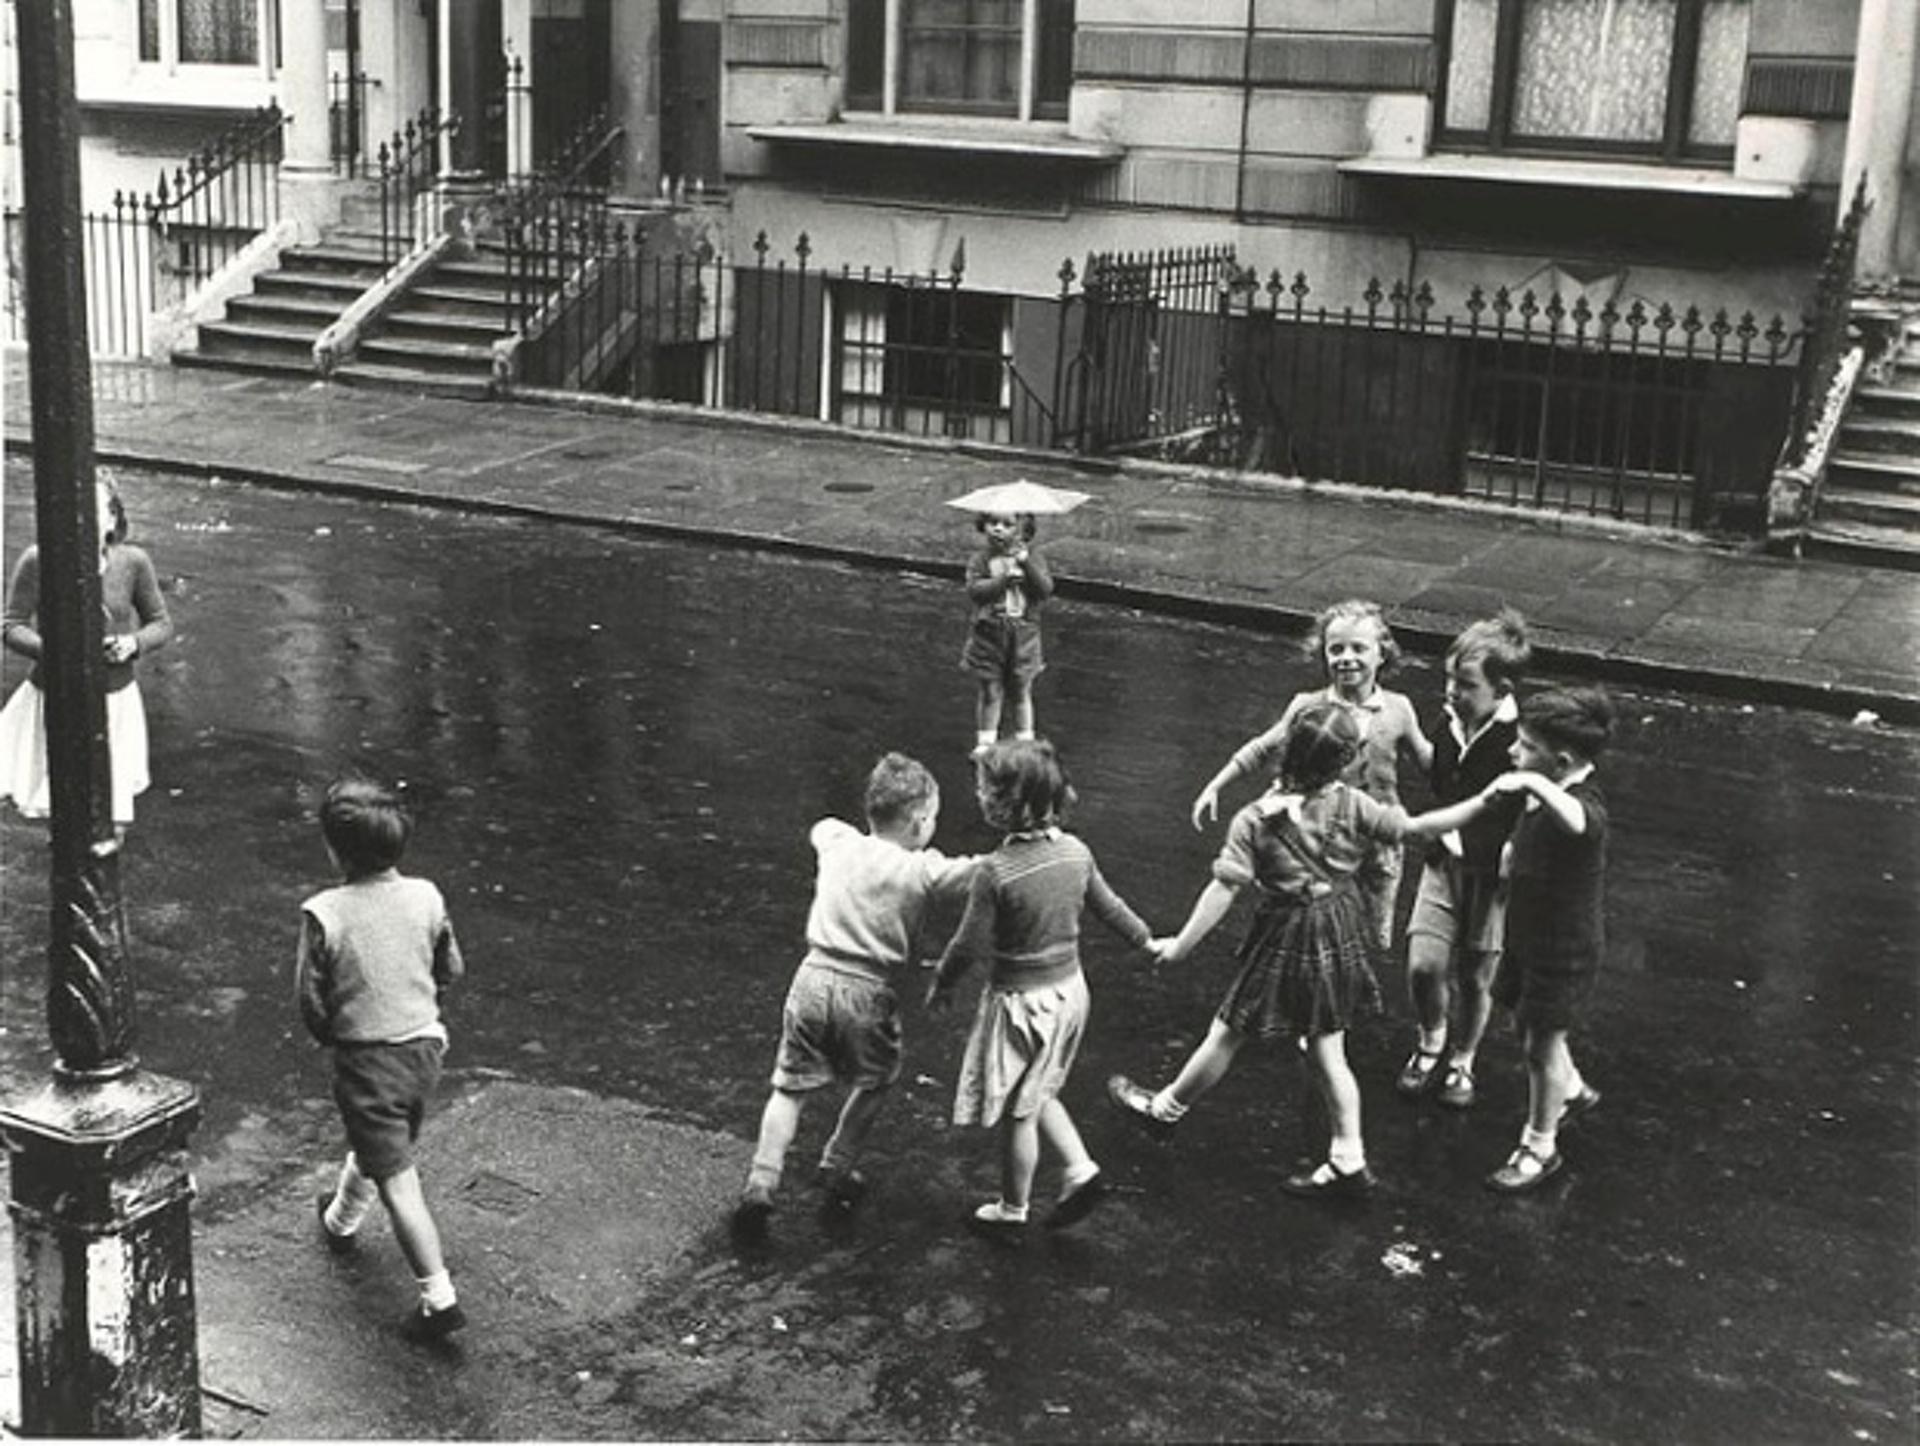 1957. Дети на дороге. Ст. Стефенс гарденс, Лондон